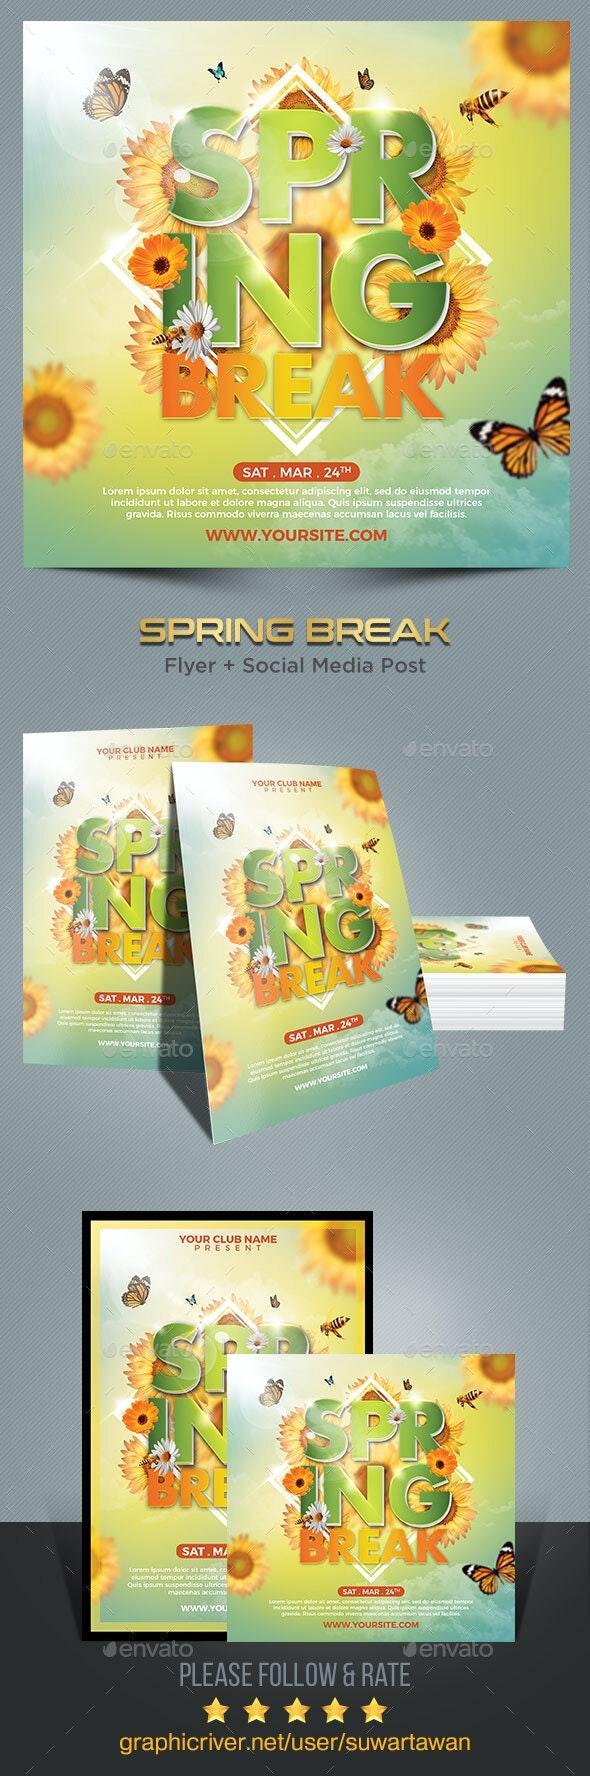 Spring Break Flyer Template - Print Templates